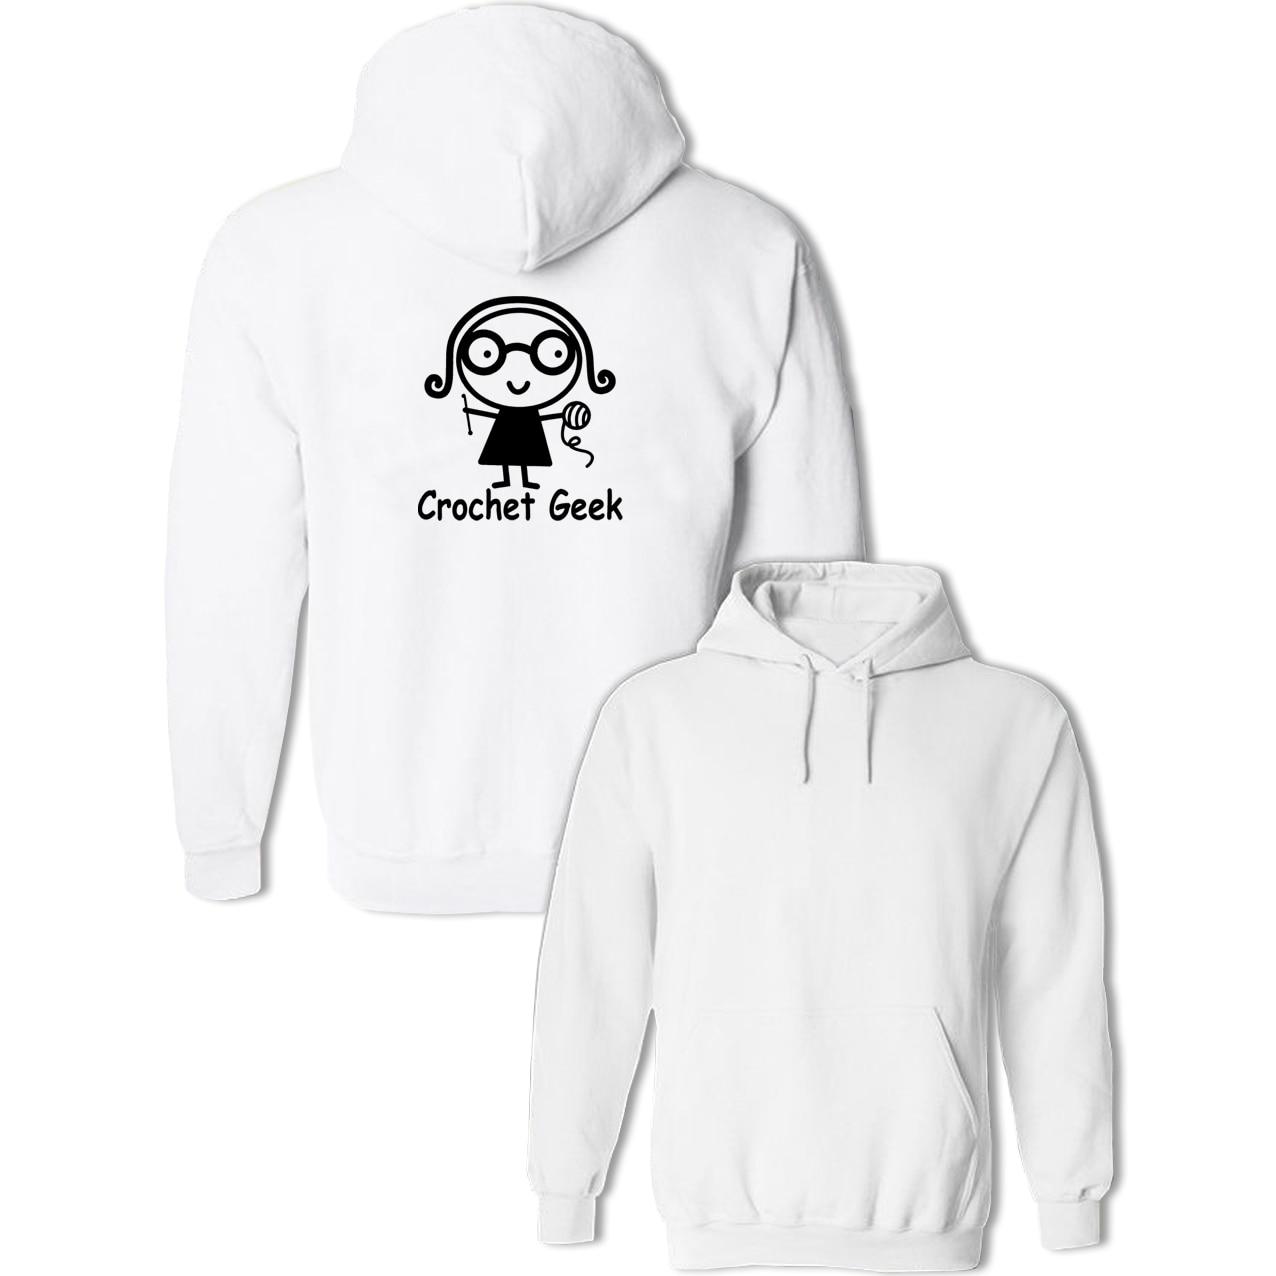 Kawaii Crochet Geek Design Hoodies Women Harajuku Jackets Spring Autumn Early Winter Pullovers Hip Hop Sweatshirts for Lady Girl